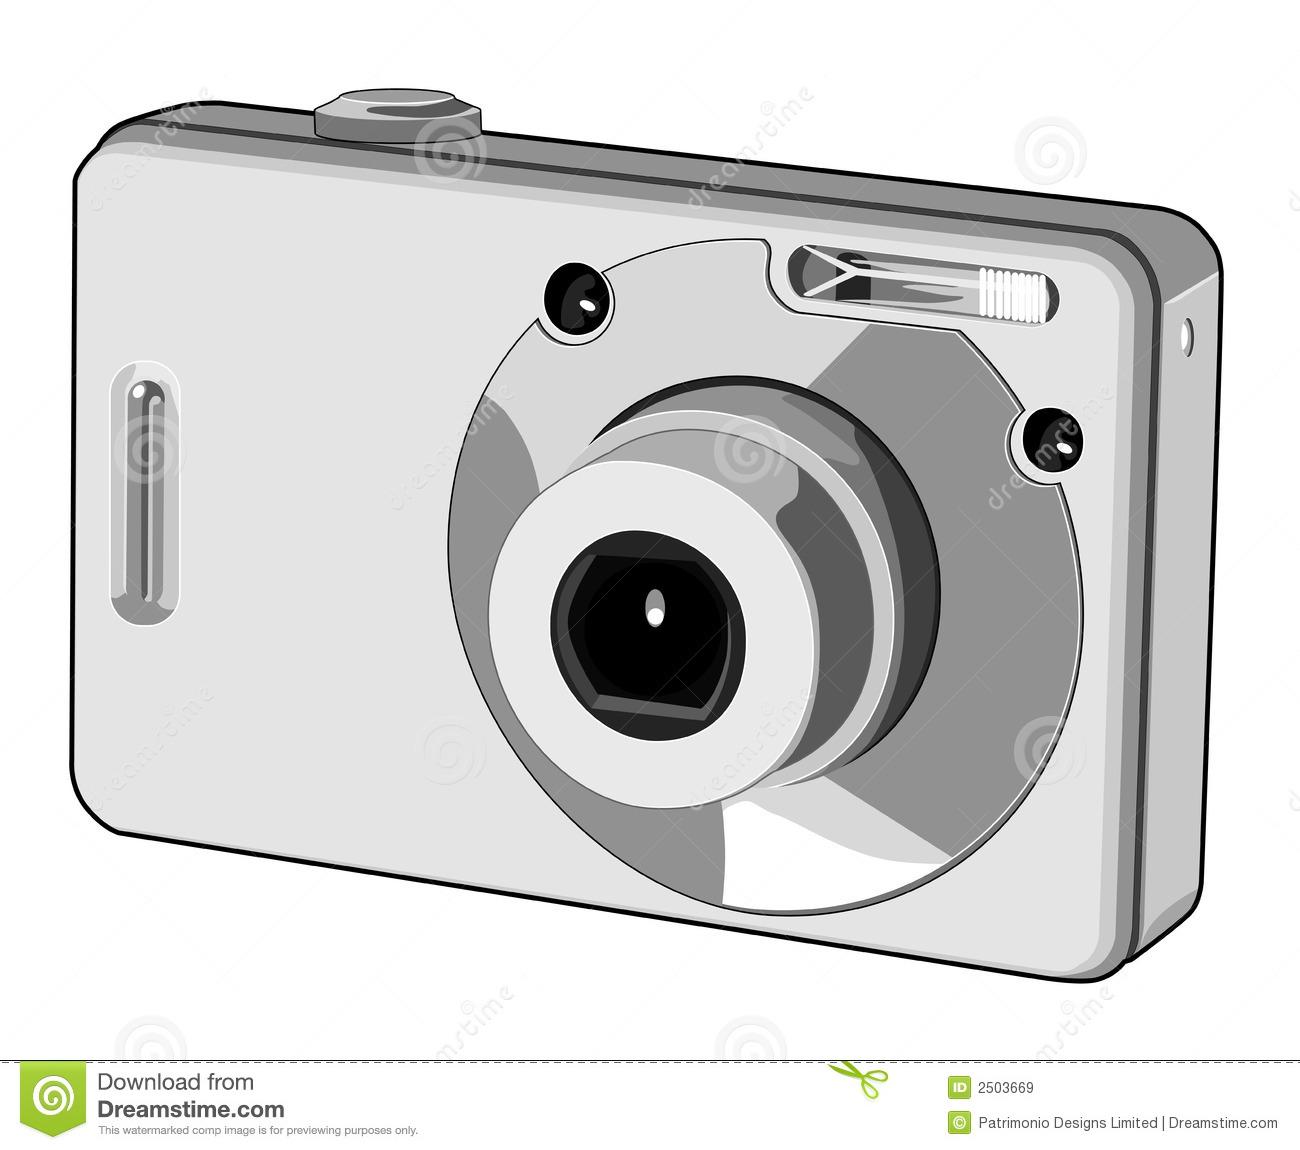 Digital camera clipart.